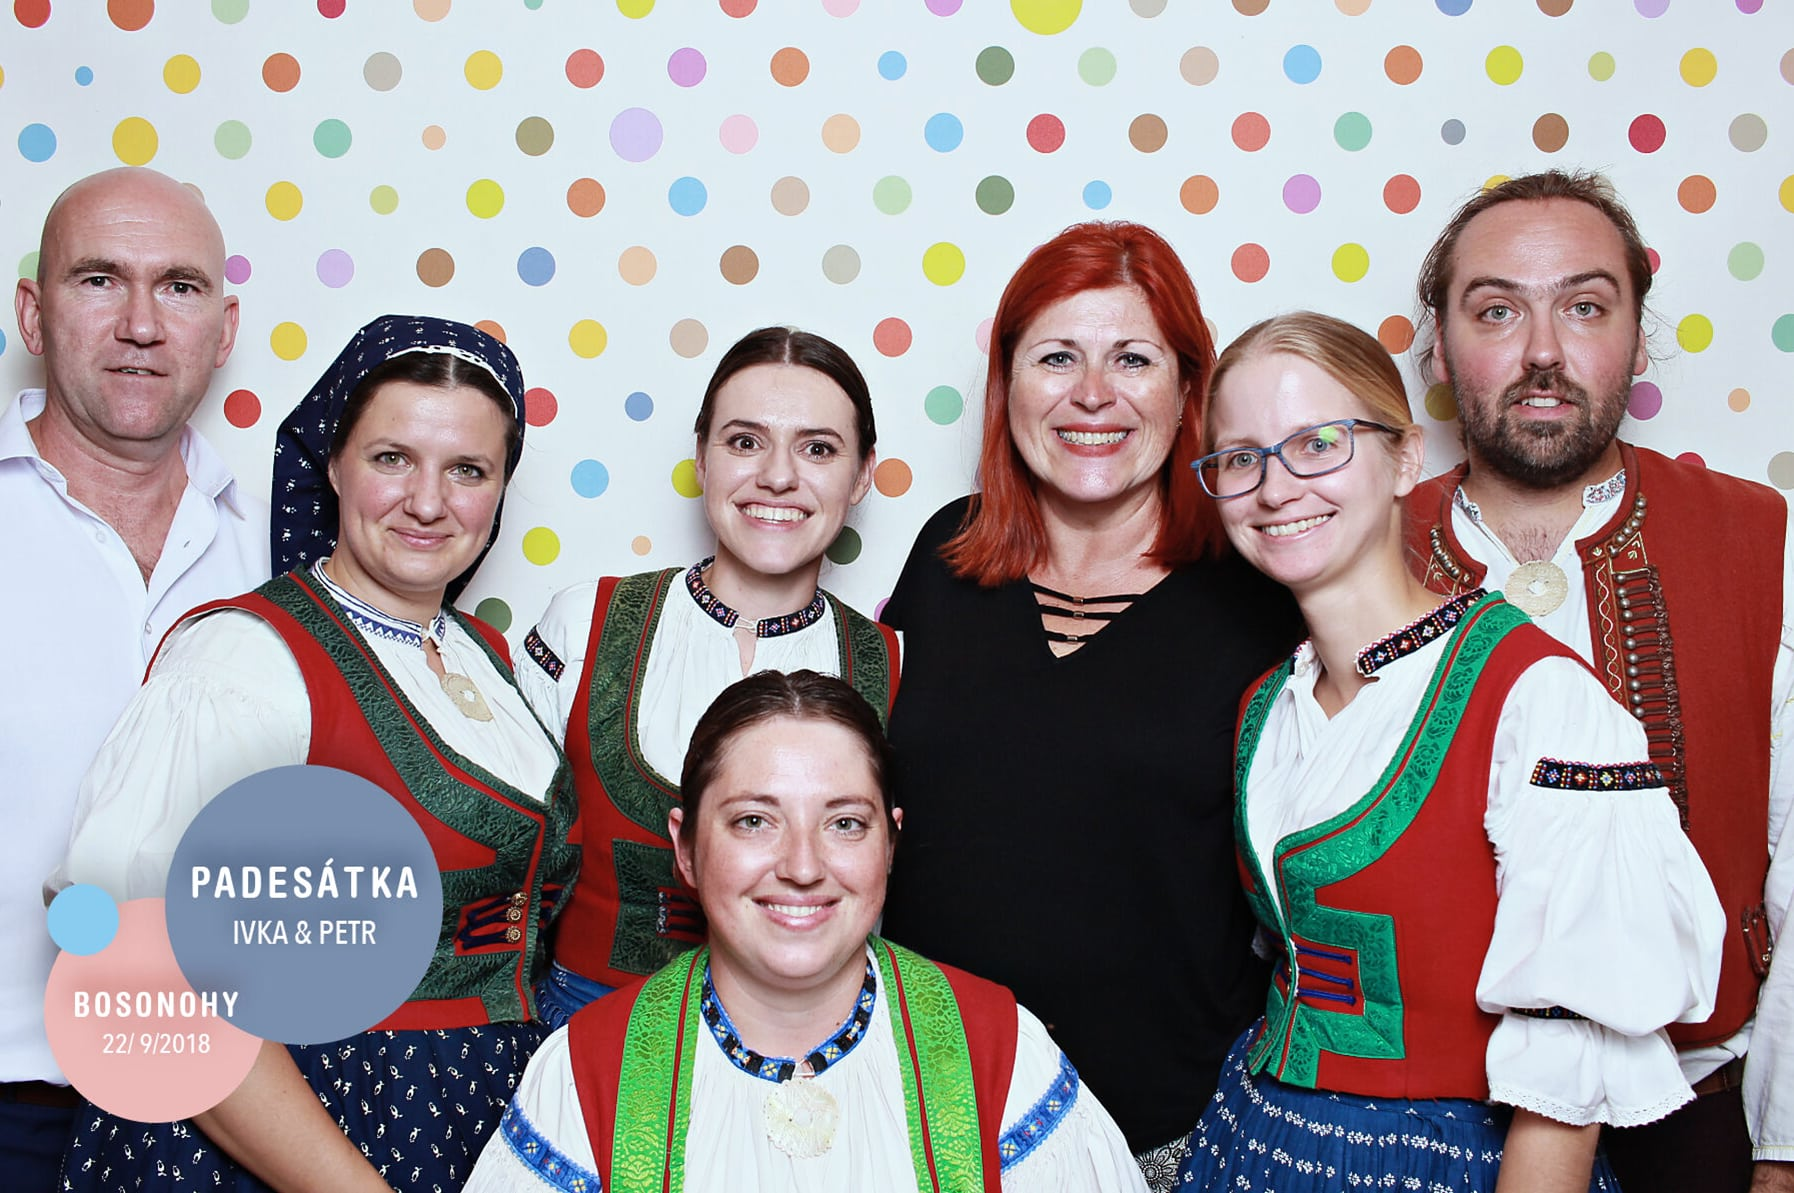 fotokoutek-padesatka-ivka-petr-22-9-2018-494448